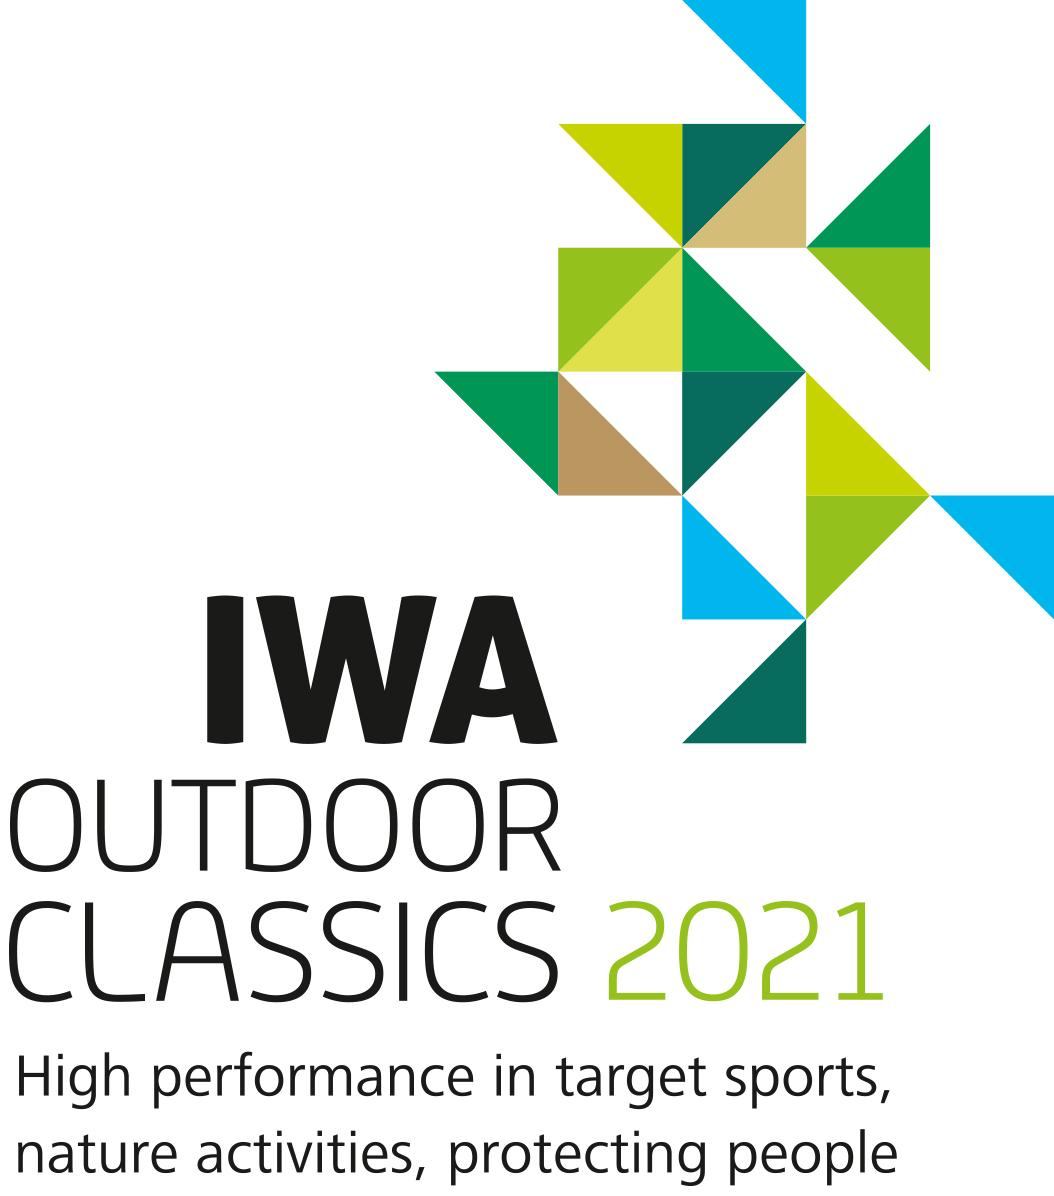 IWA OUTDOOR CLASSICS 2021